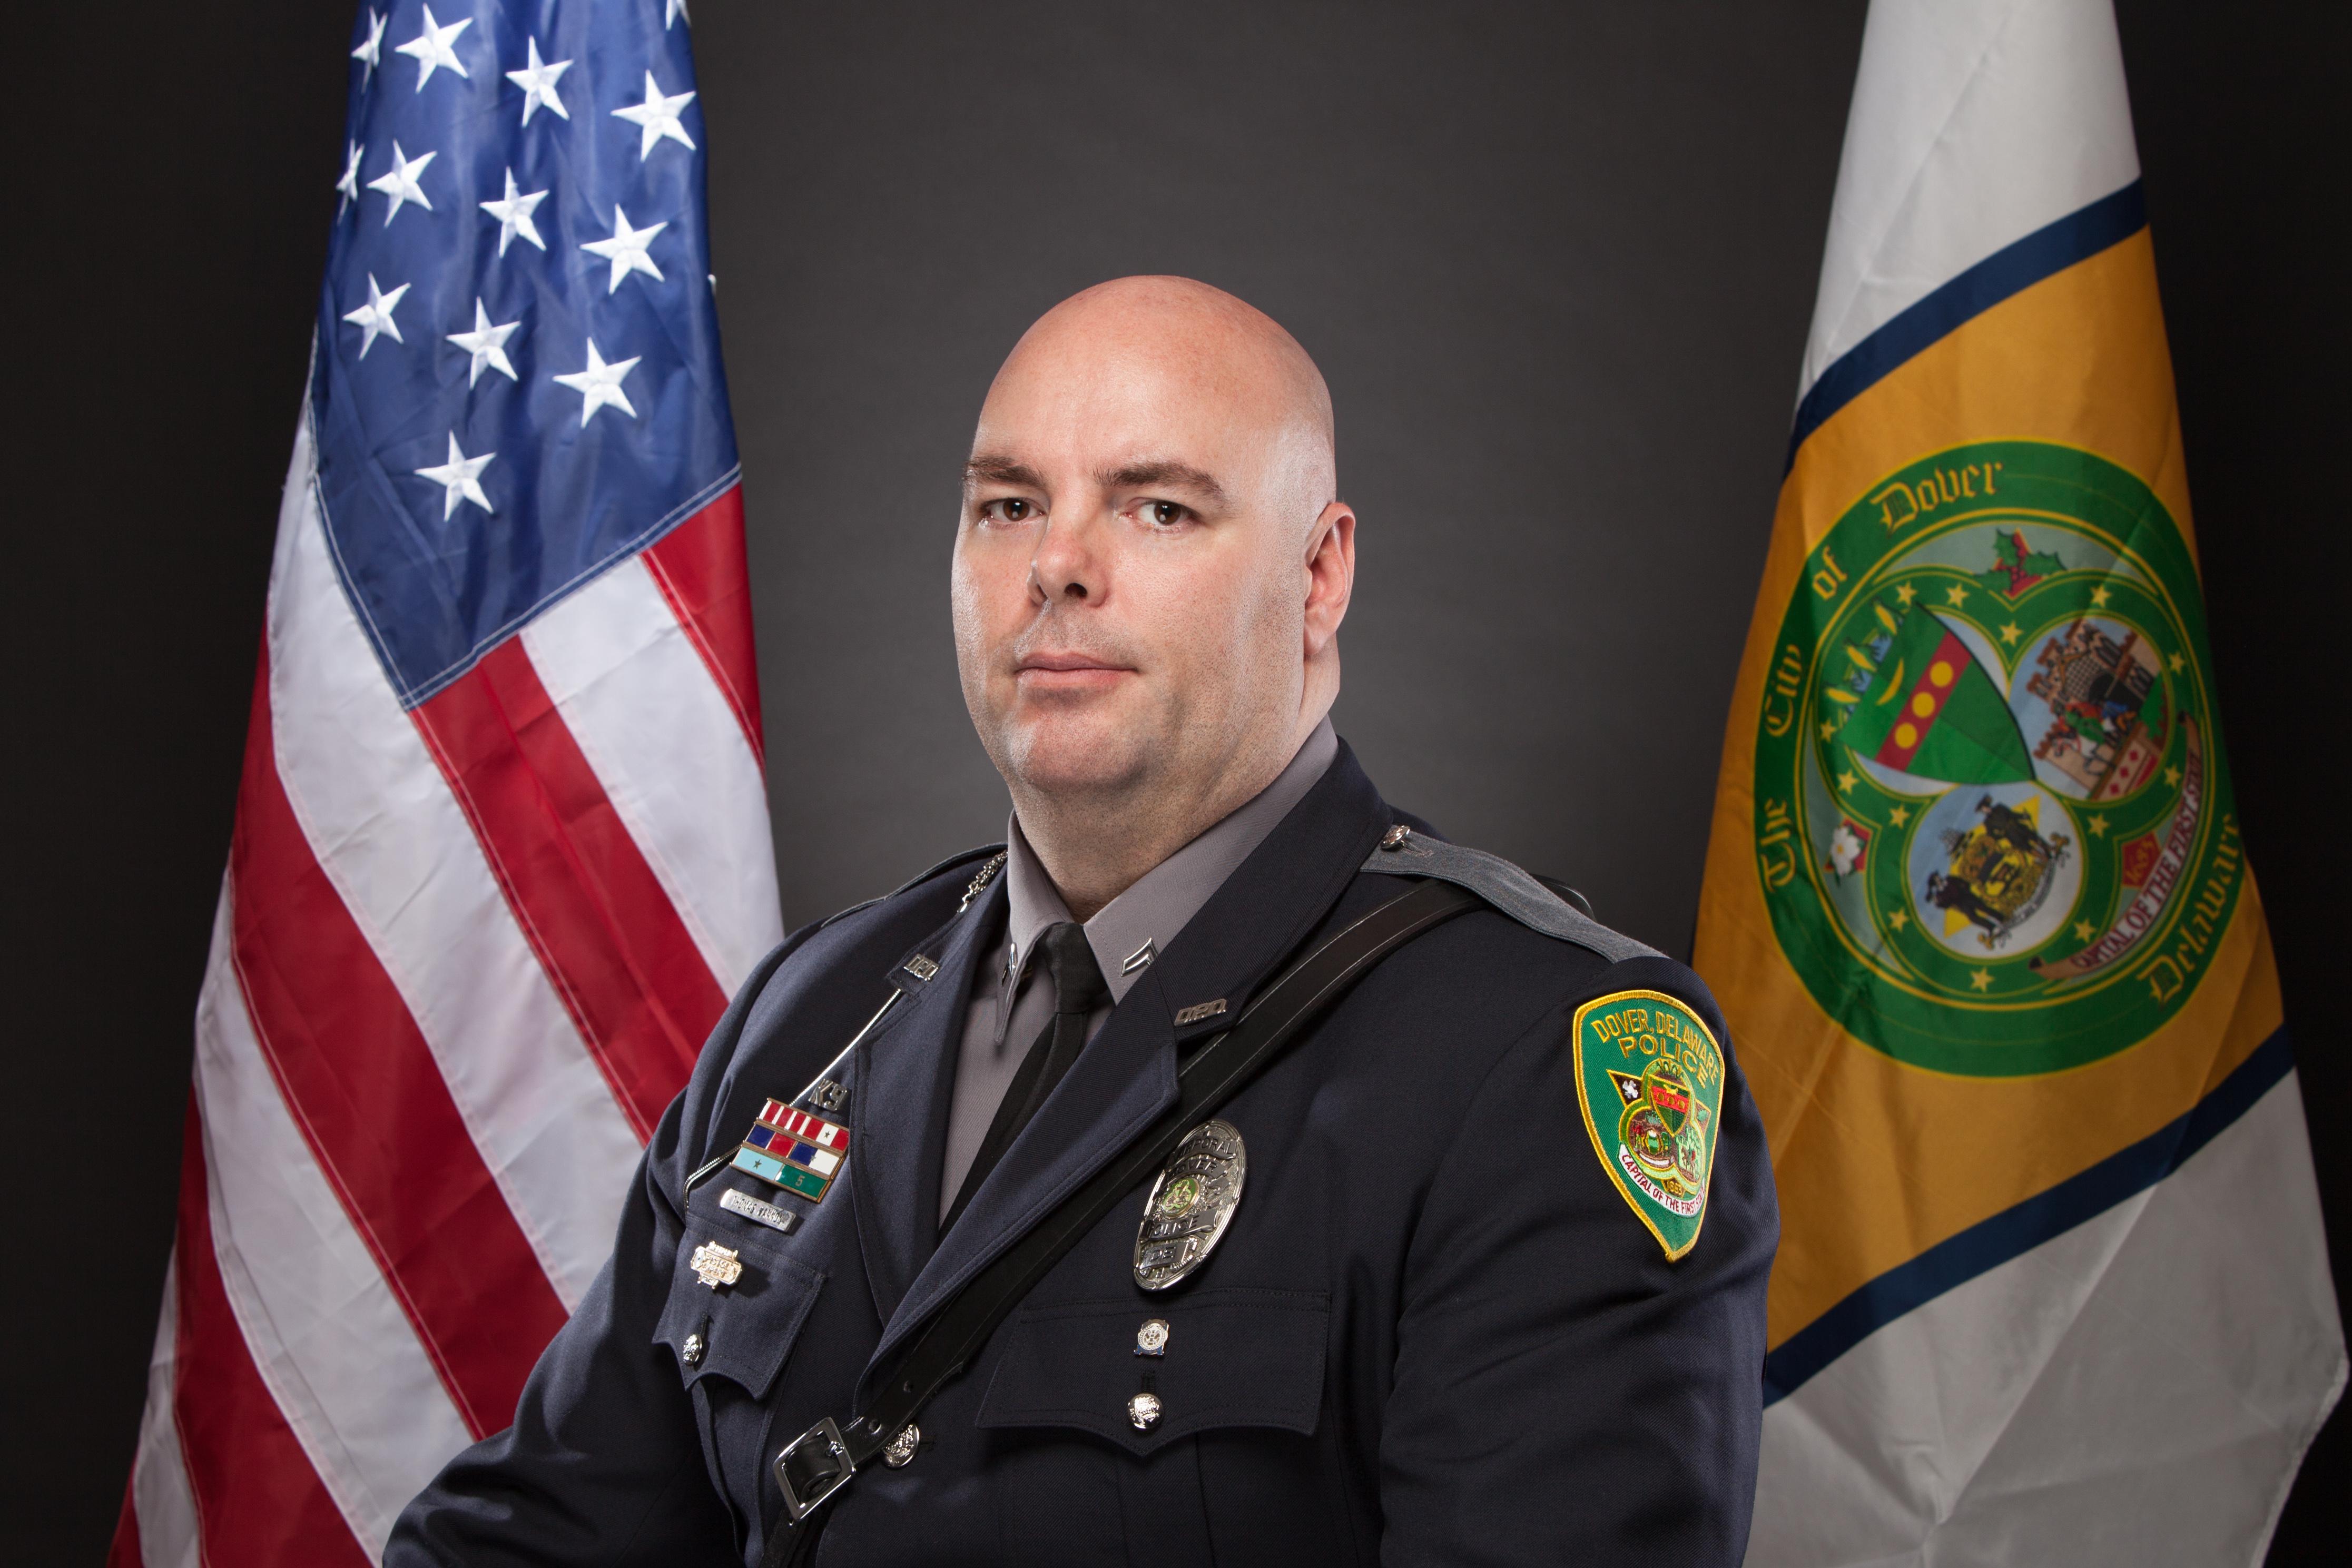 Corporal Thomas John Hannon, Sr. | Dover Police Department, Delaware